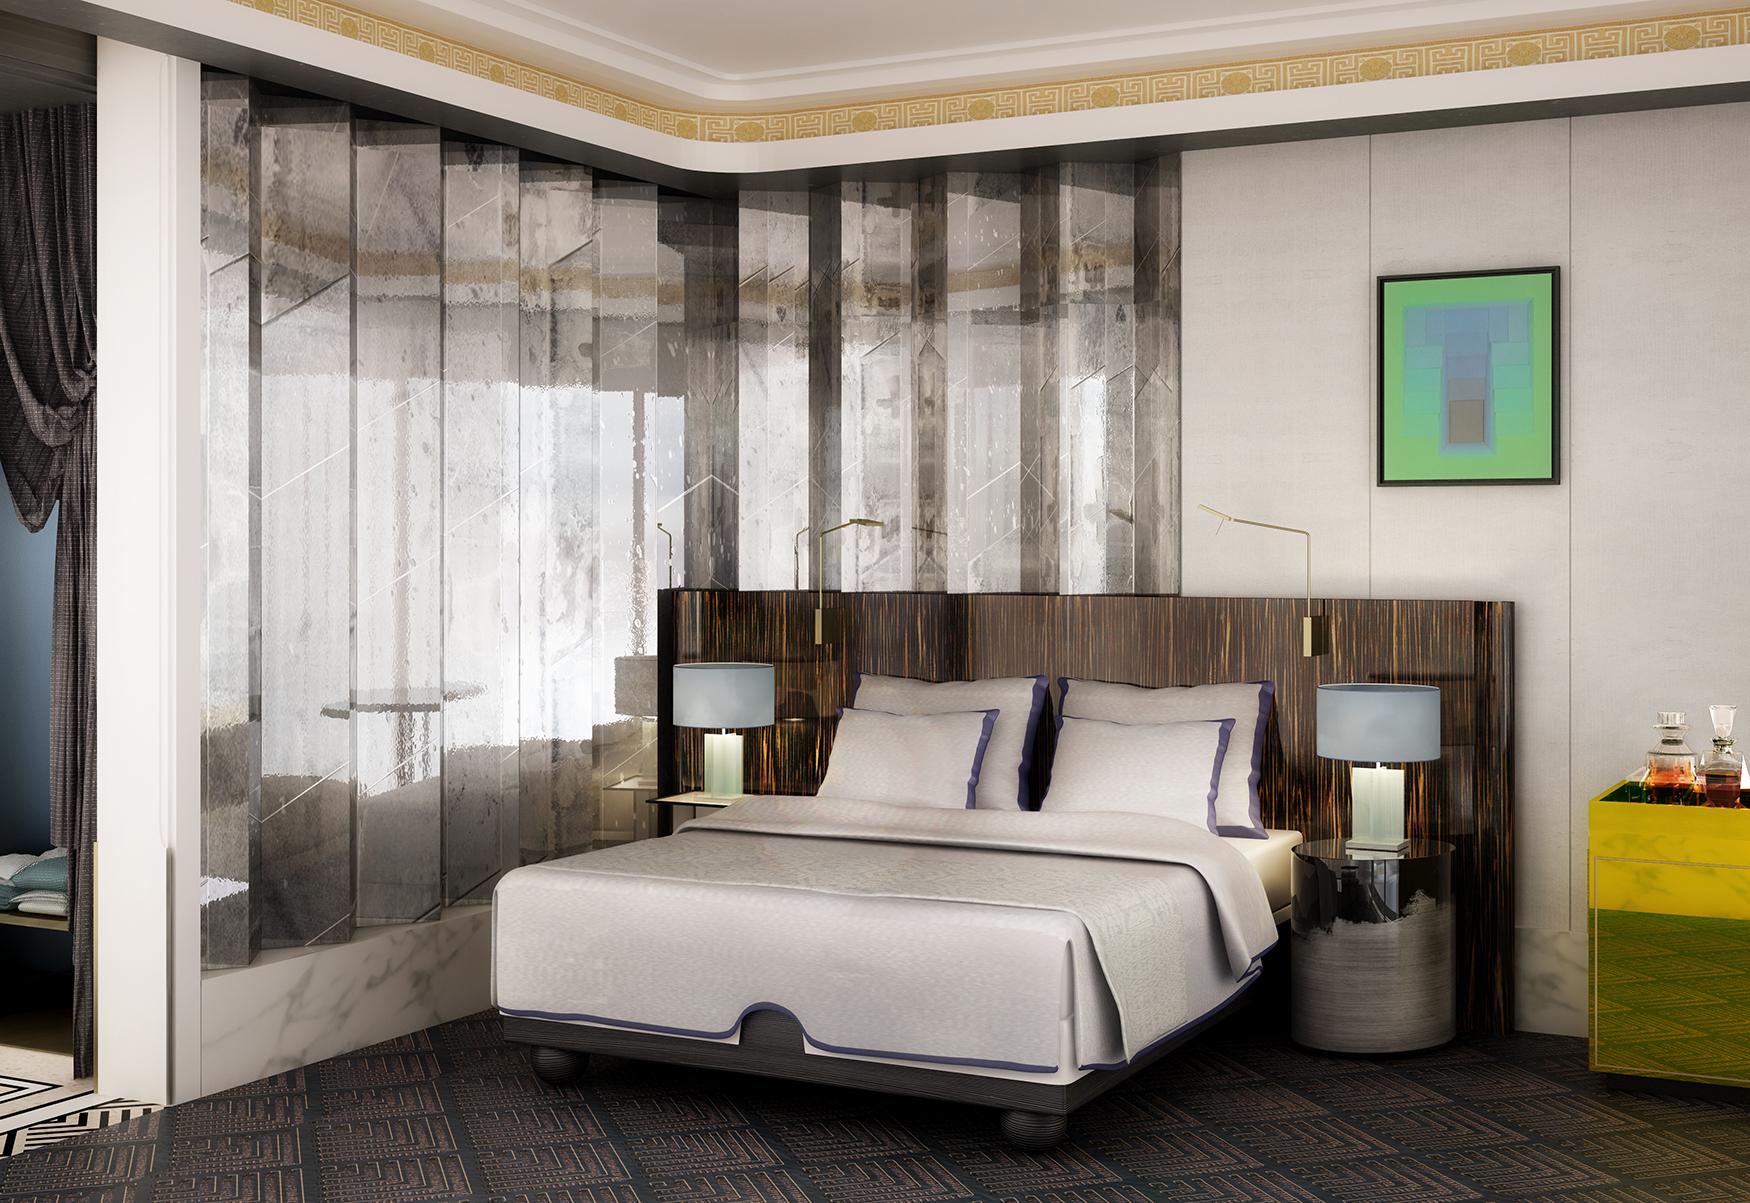 sandrinefaivre-tristanauer-architecture-interieure-hotel-2013-sofitel-moscou-05